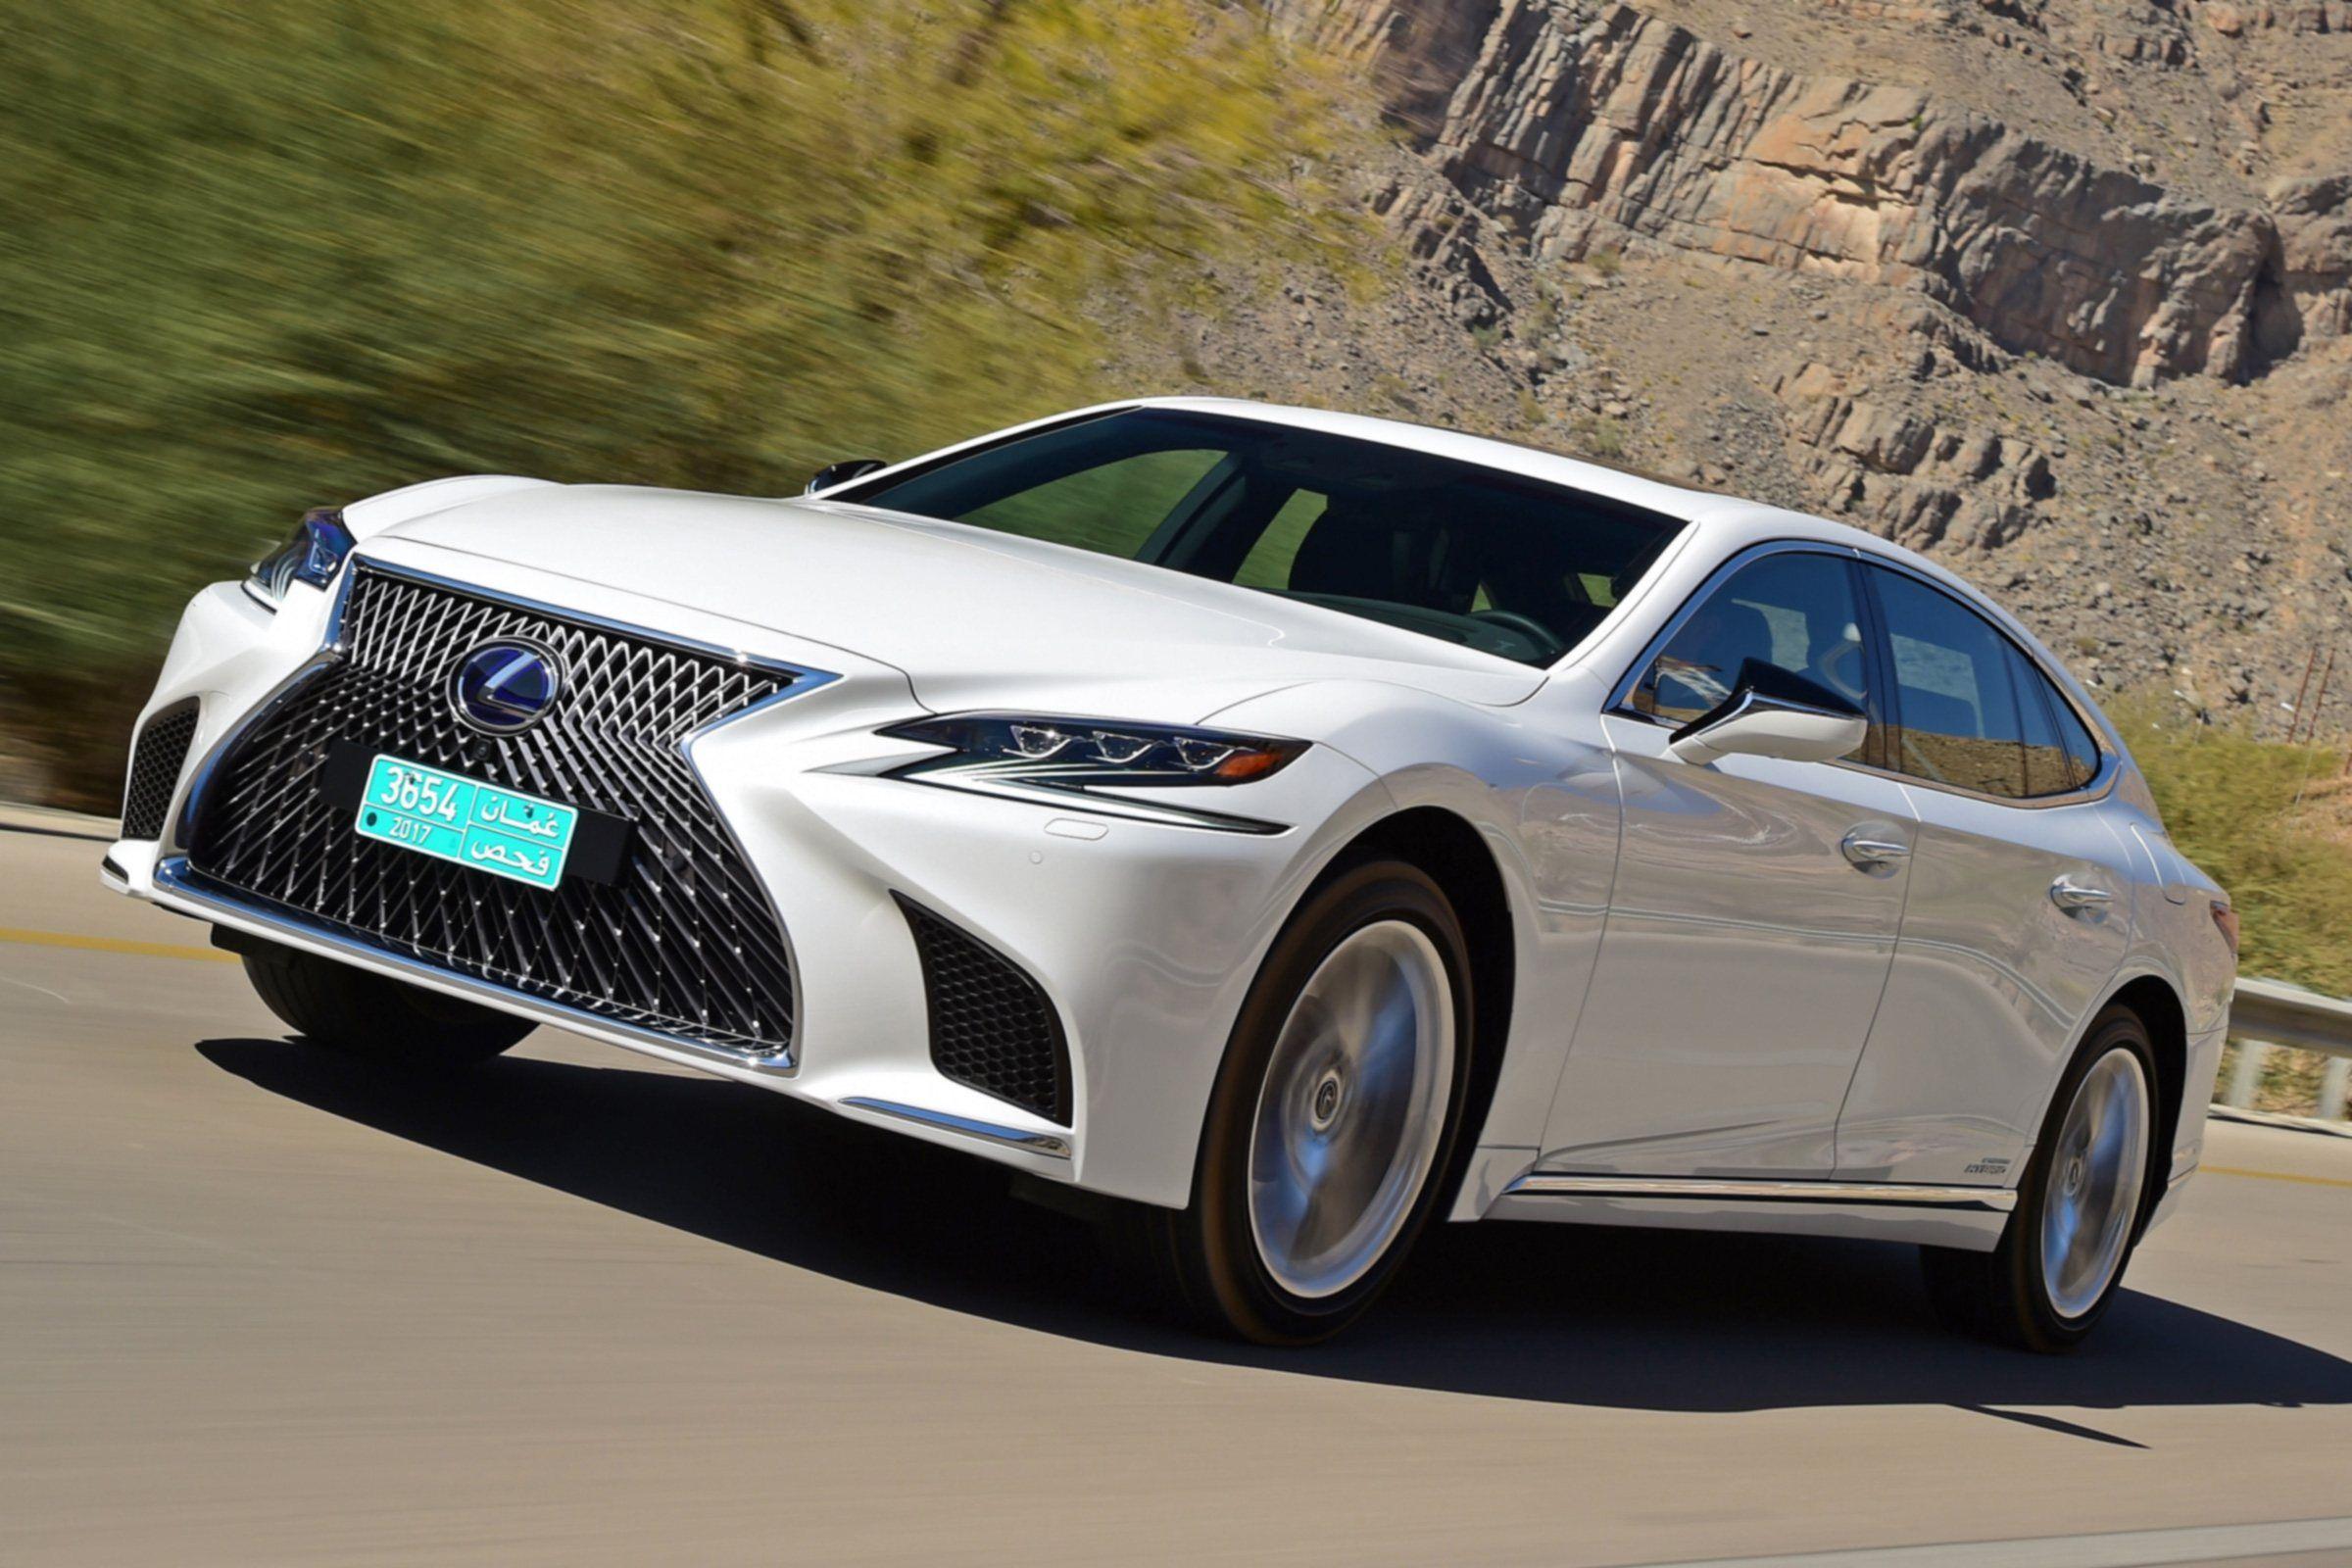 2021 Lexus Ls 460 Images in 2020 (With images) Lexus ls